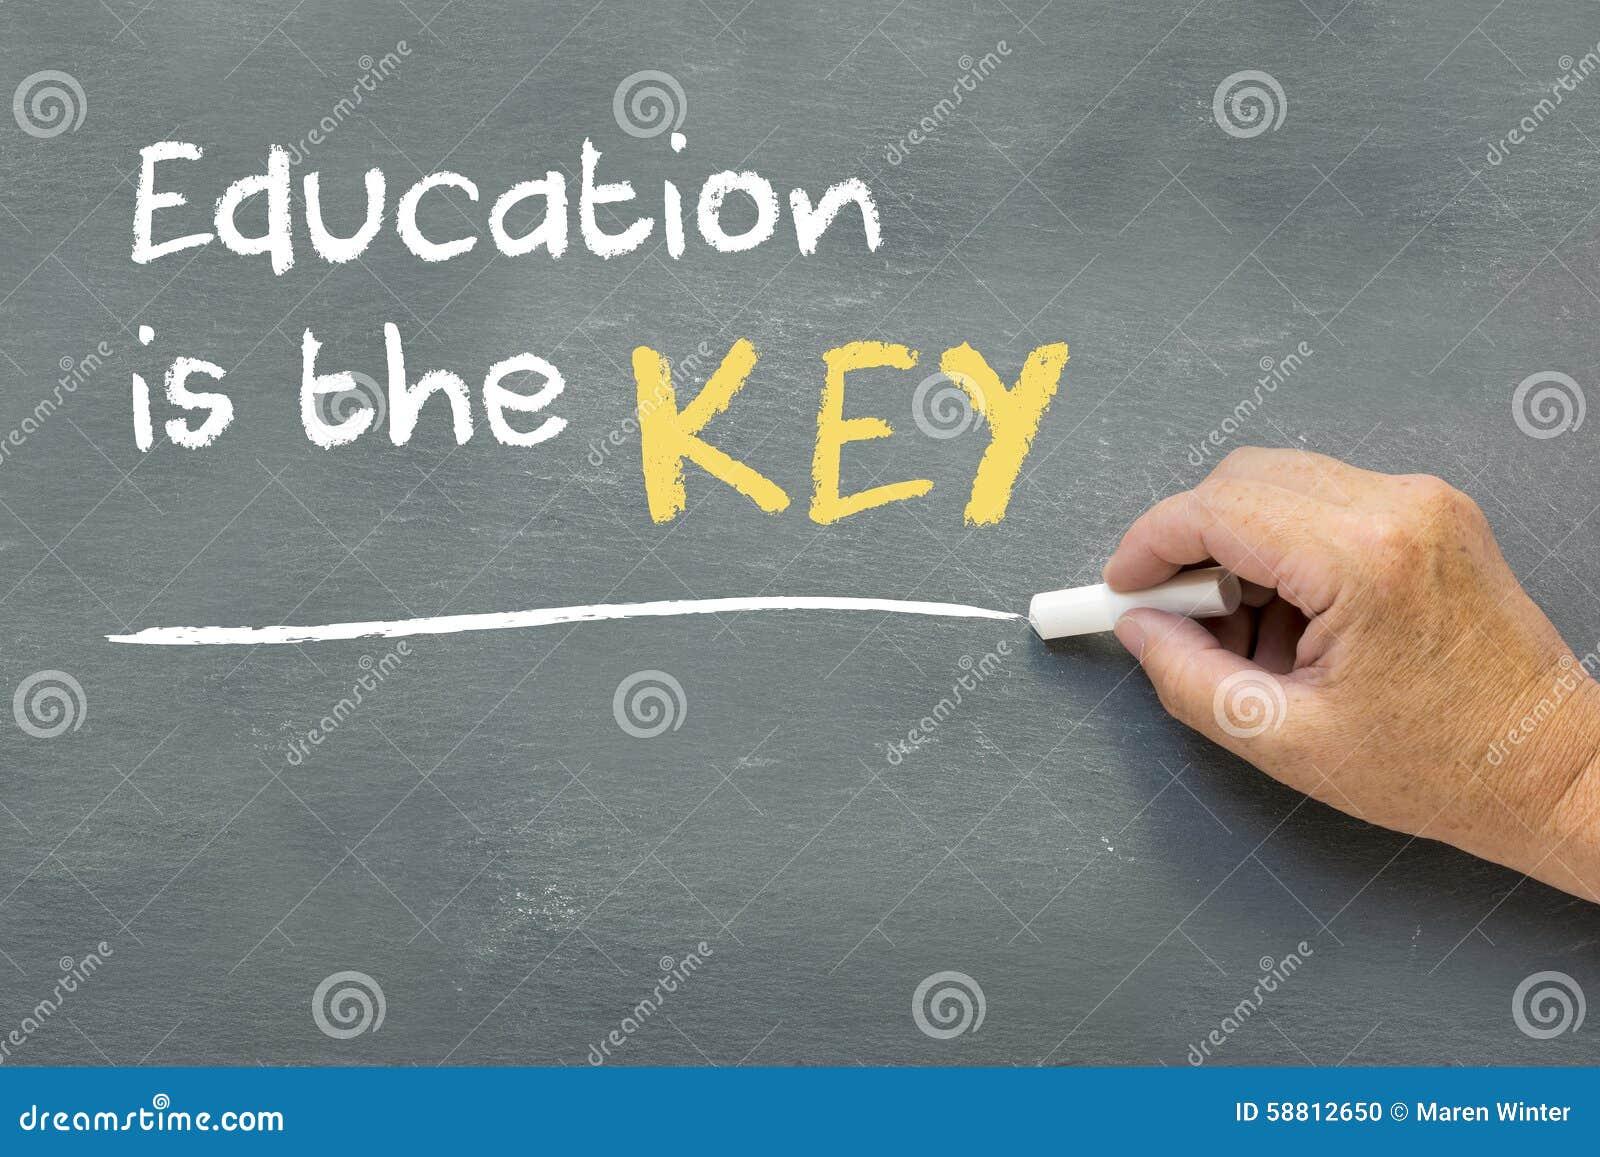 How to write a key message